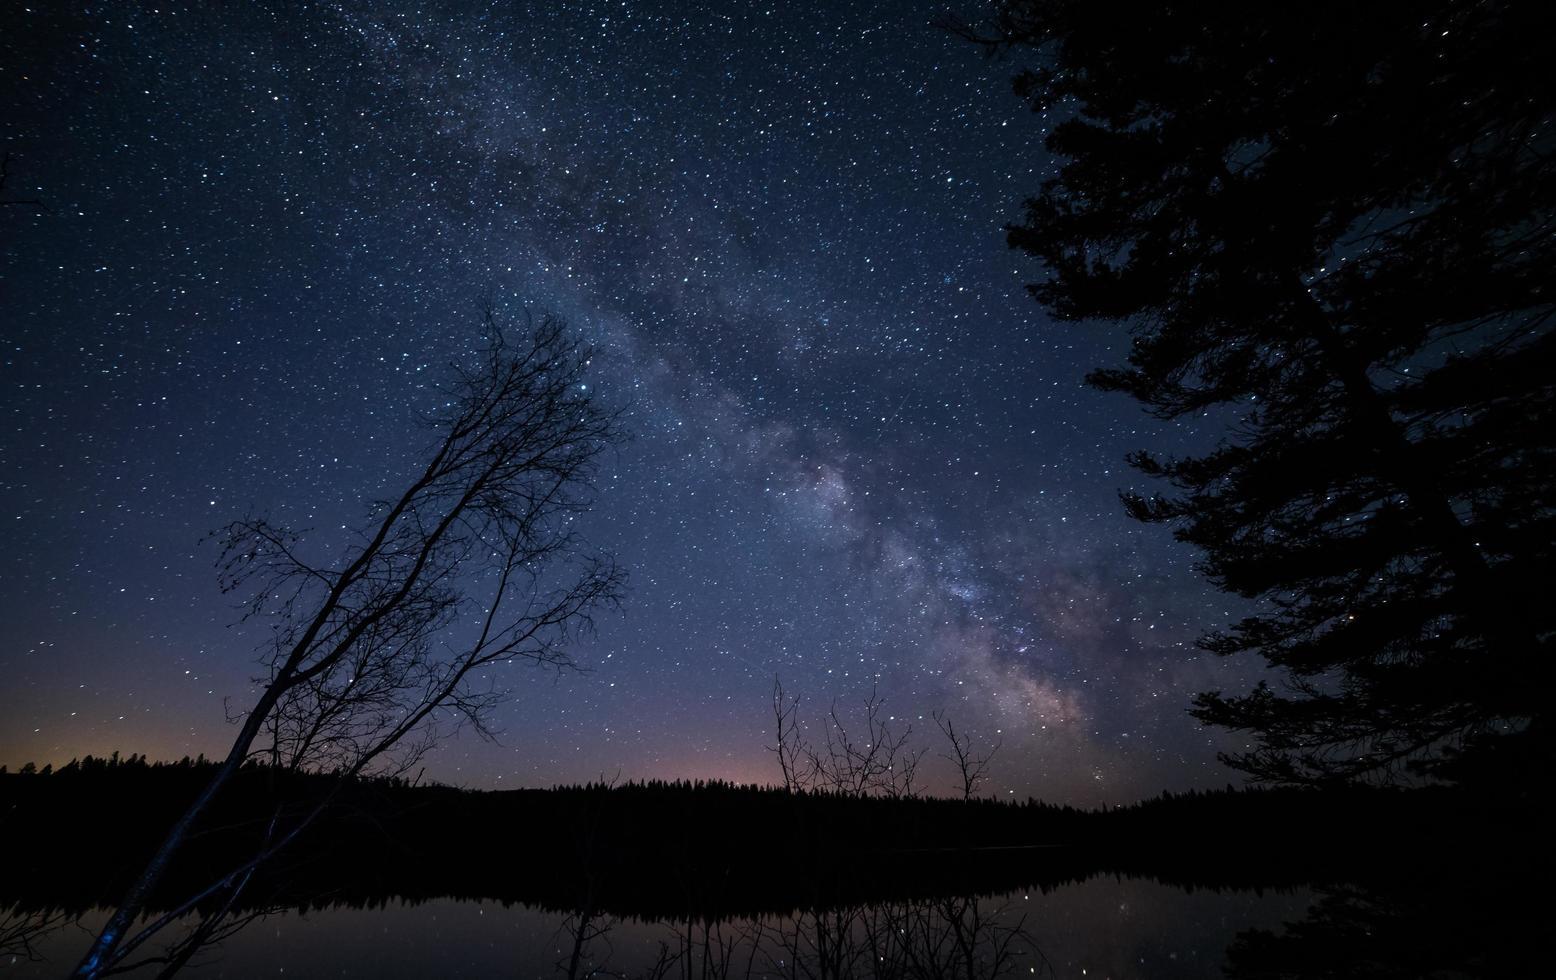 Trees under starry sky photo